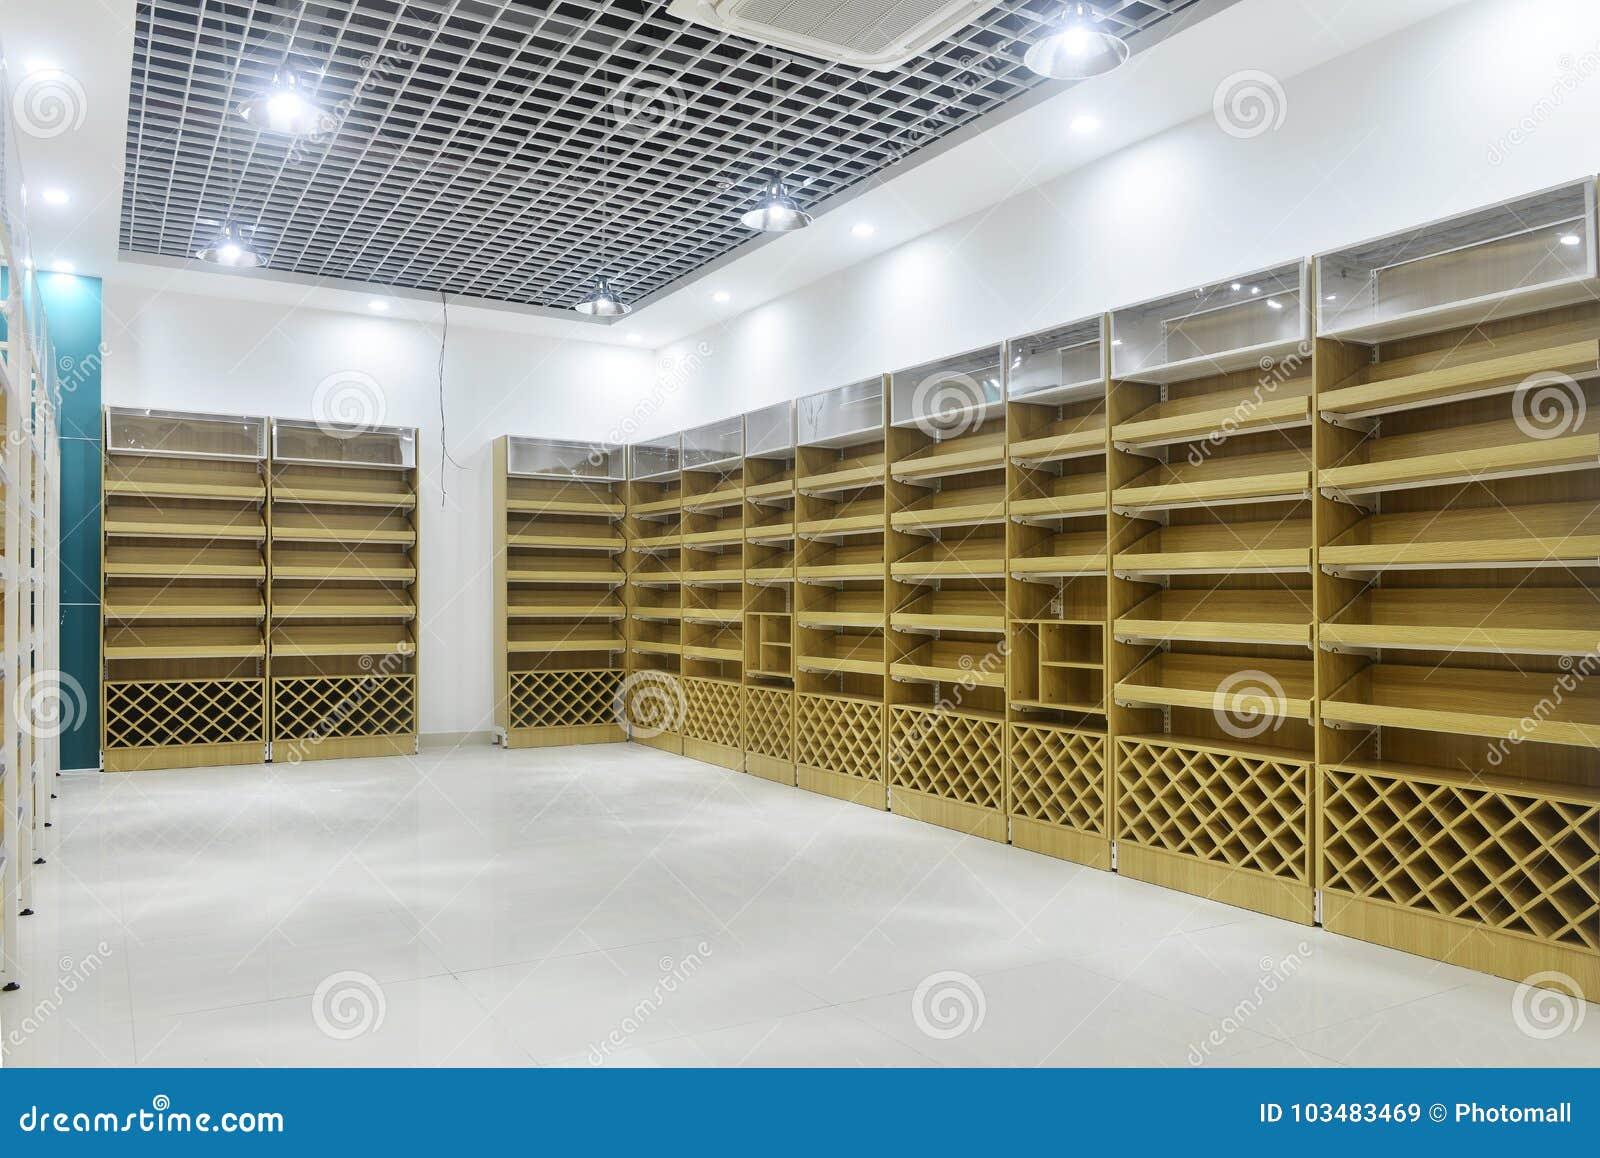 Leere Ladenregale des Supermarktinnenraums